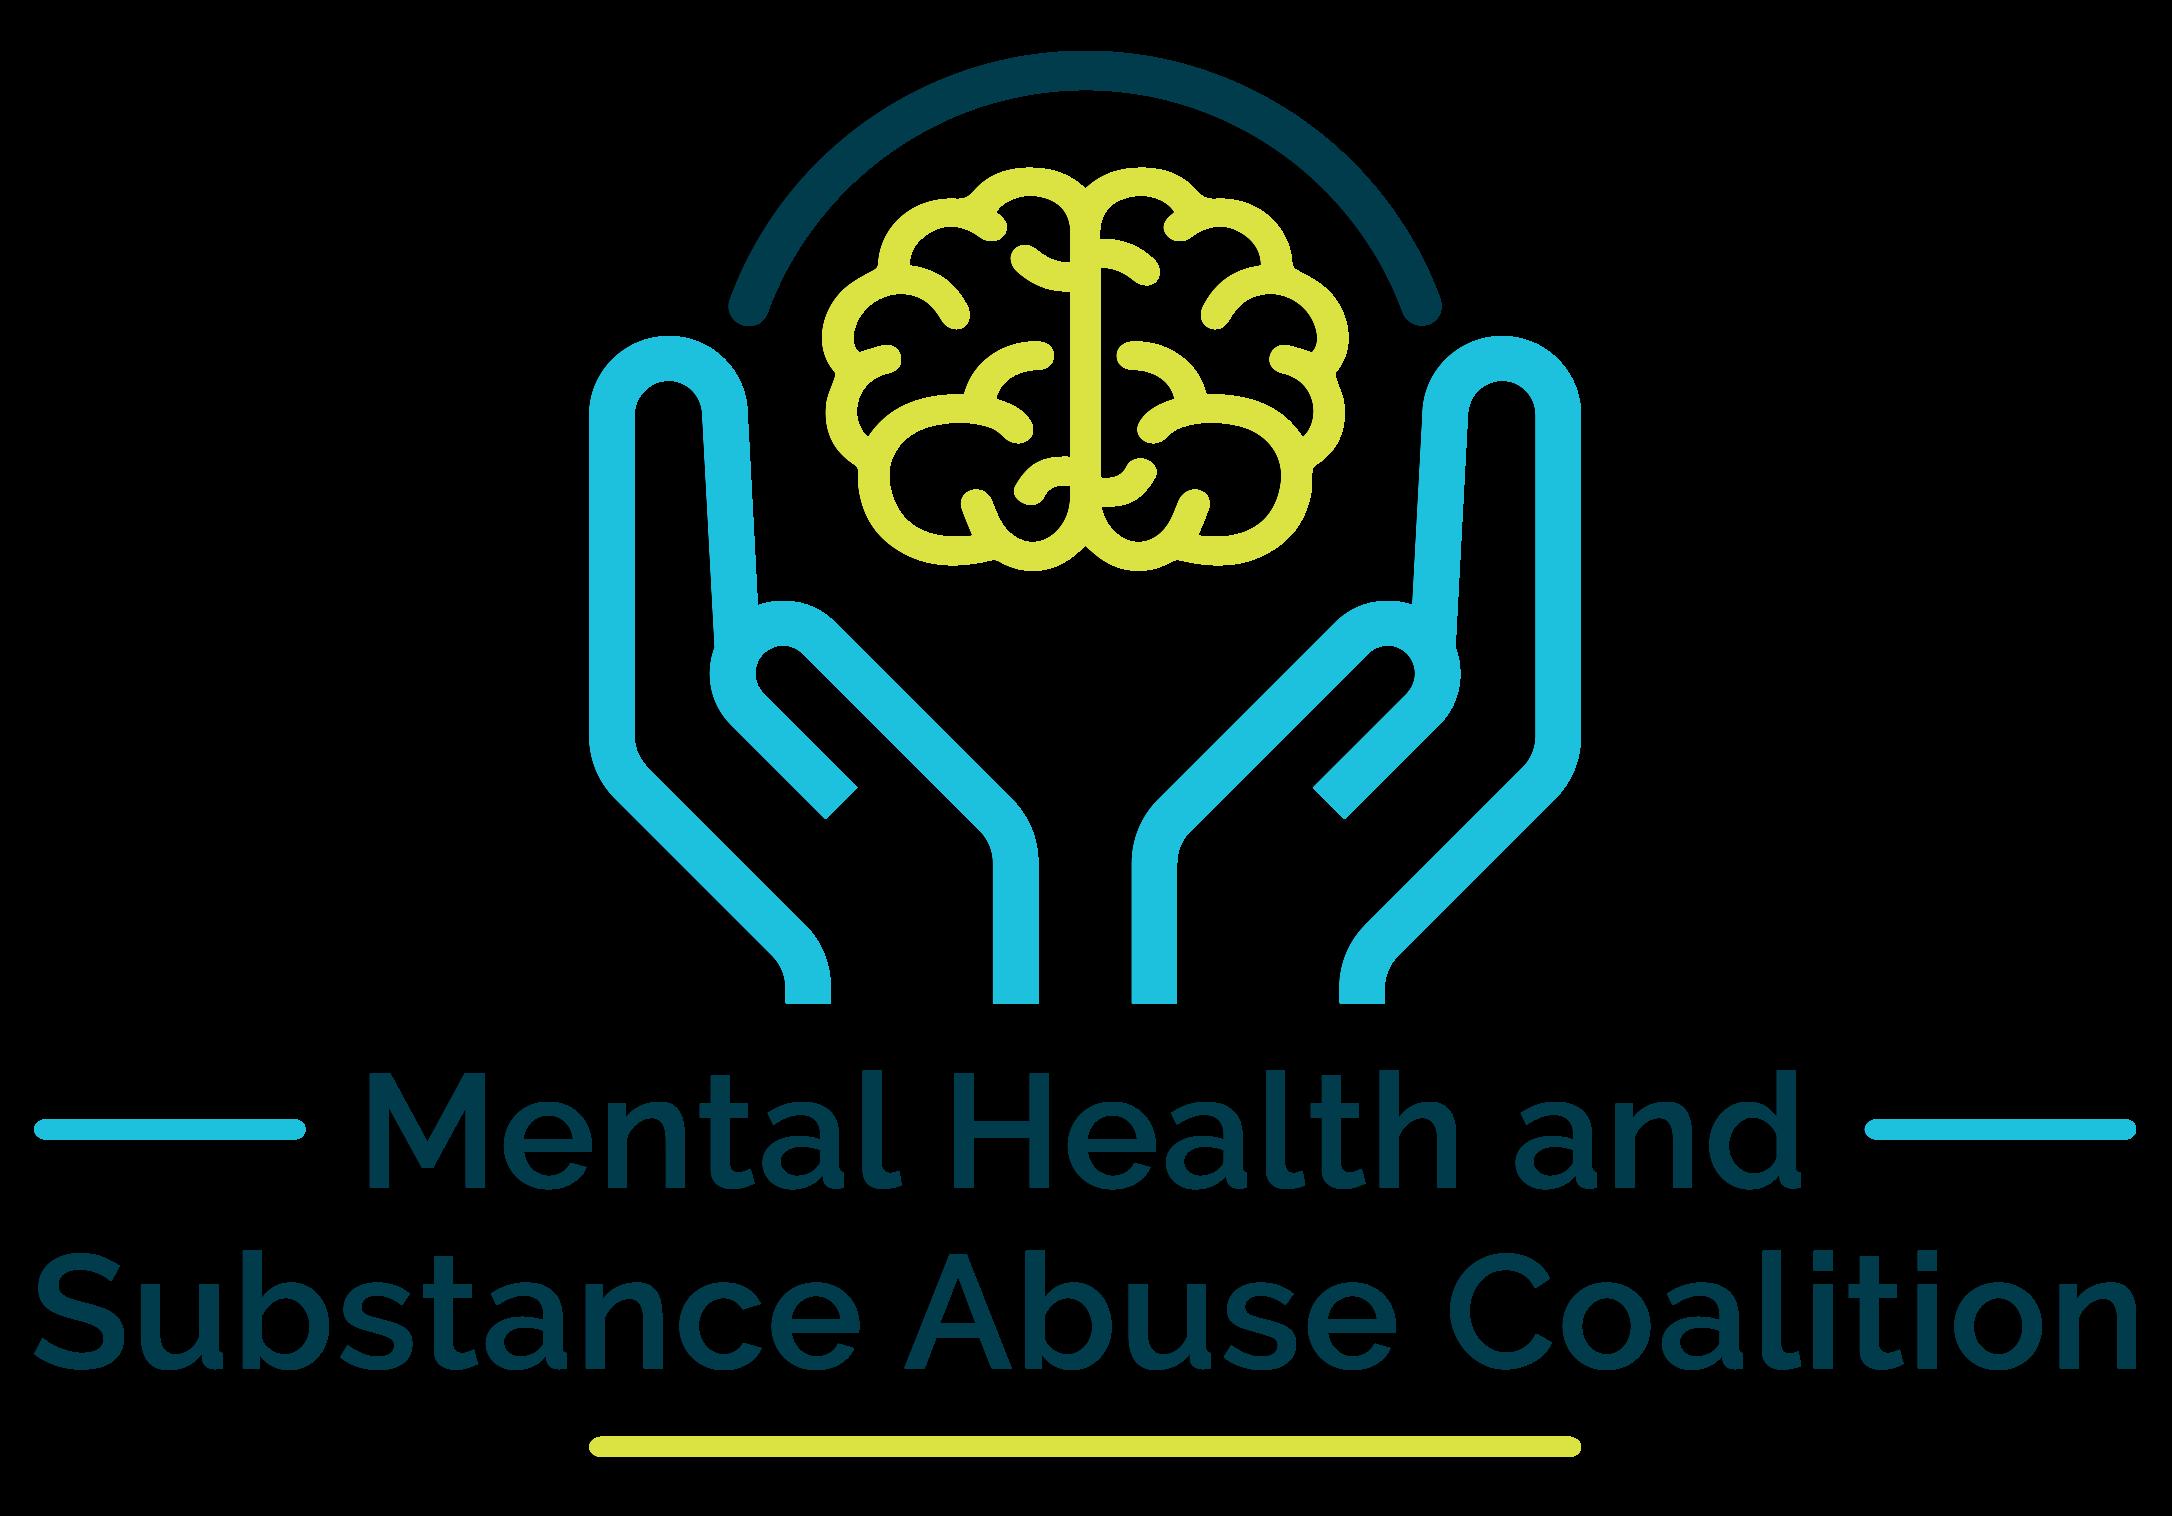 Mental Health & Substance Abuse Coalition